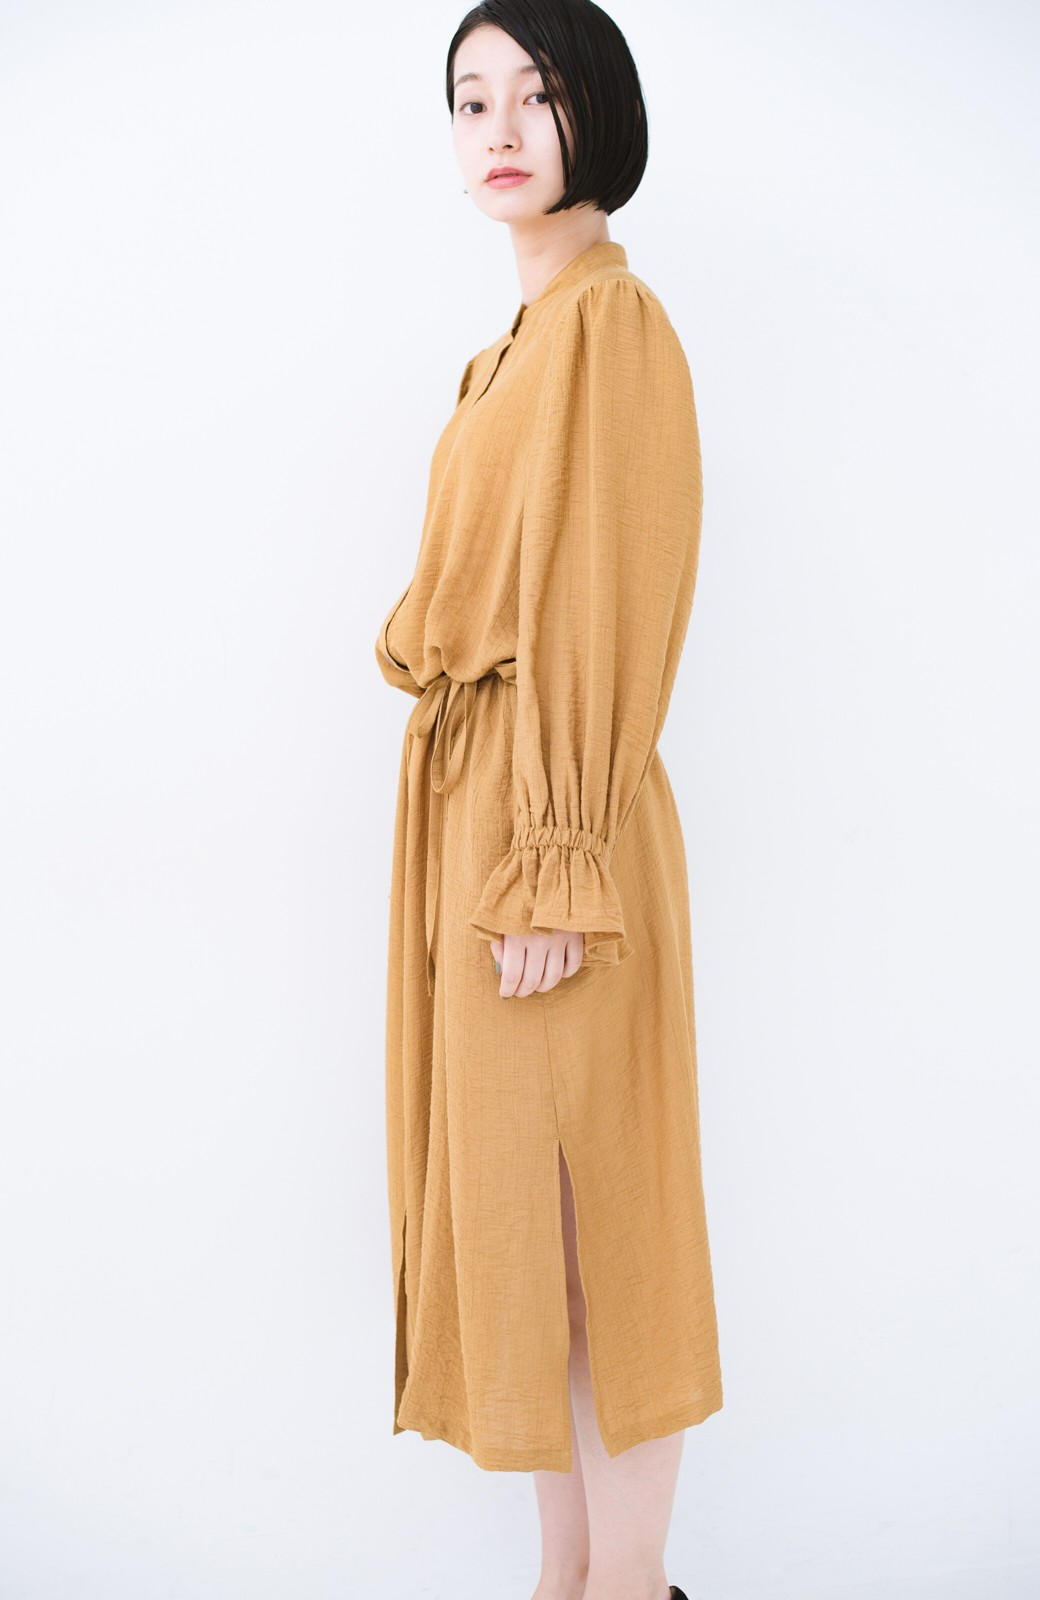 haco! 太ってもばれず 羽織っても便利なウエストリボンワンピース <マスタード>の商品写真21